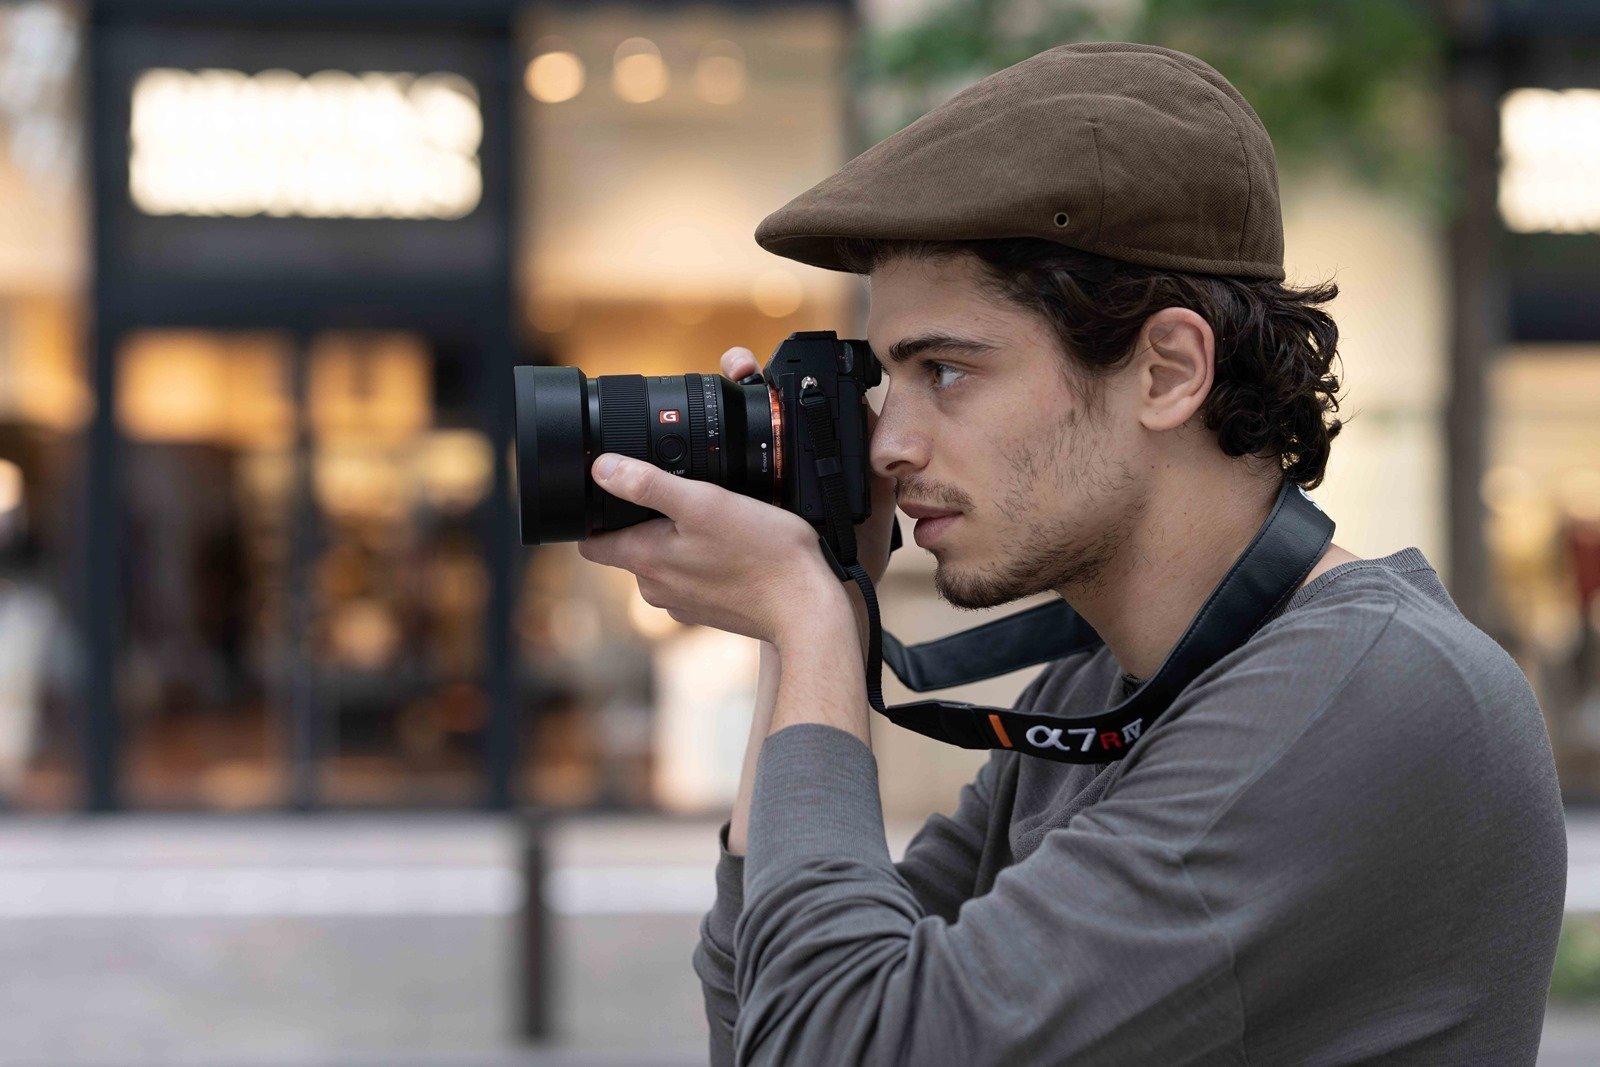 Sony FE 35mm F1.4 GM 大光圈廣角定焦鏡頭 兼具輕巧與極致畫質街拍神鏡 安靜高速對焦影片創作利器 @3C 達人廖阿輝